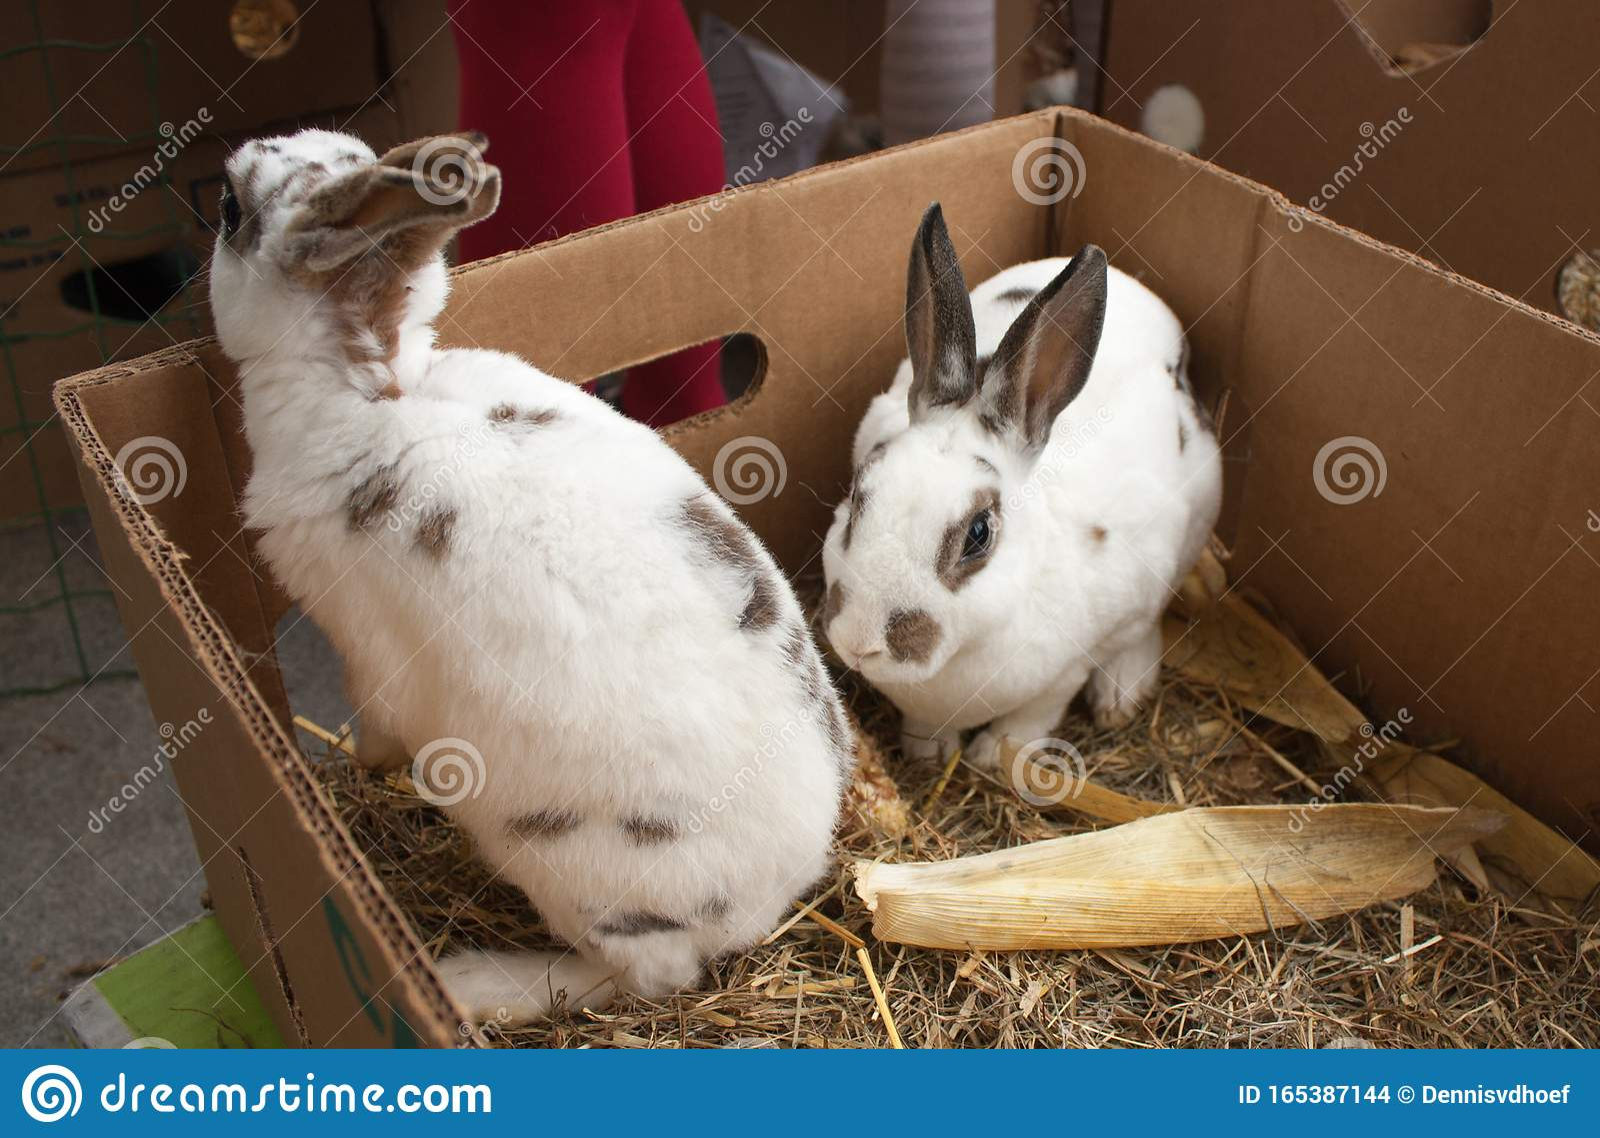 Rabbits on the animal market in Mol, Belgium.